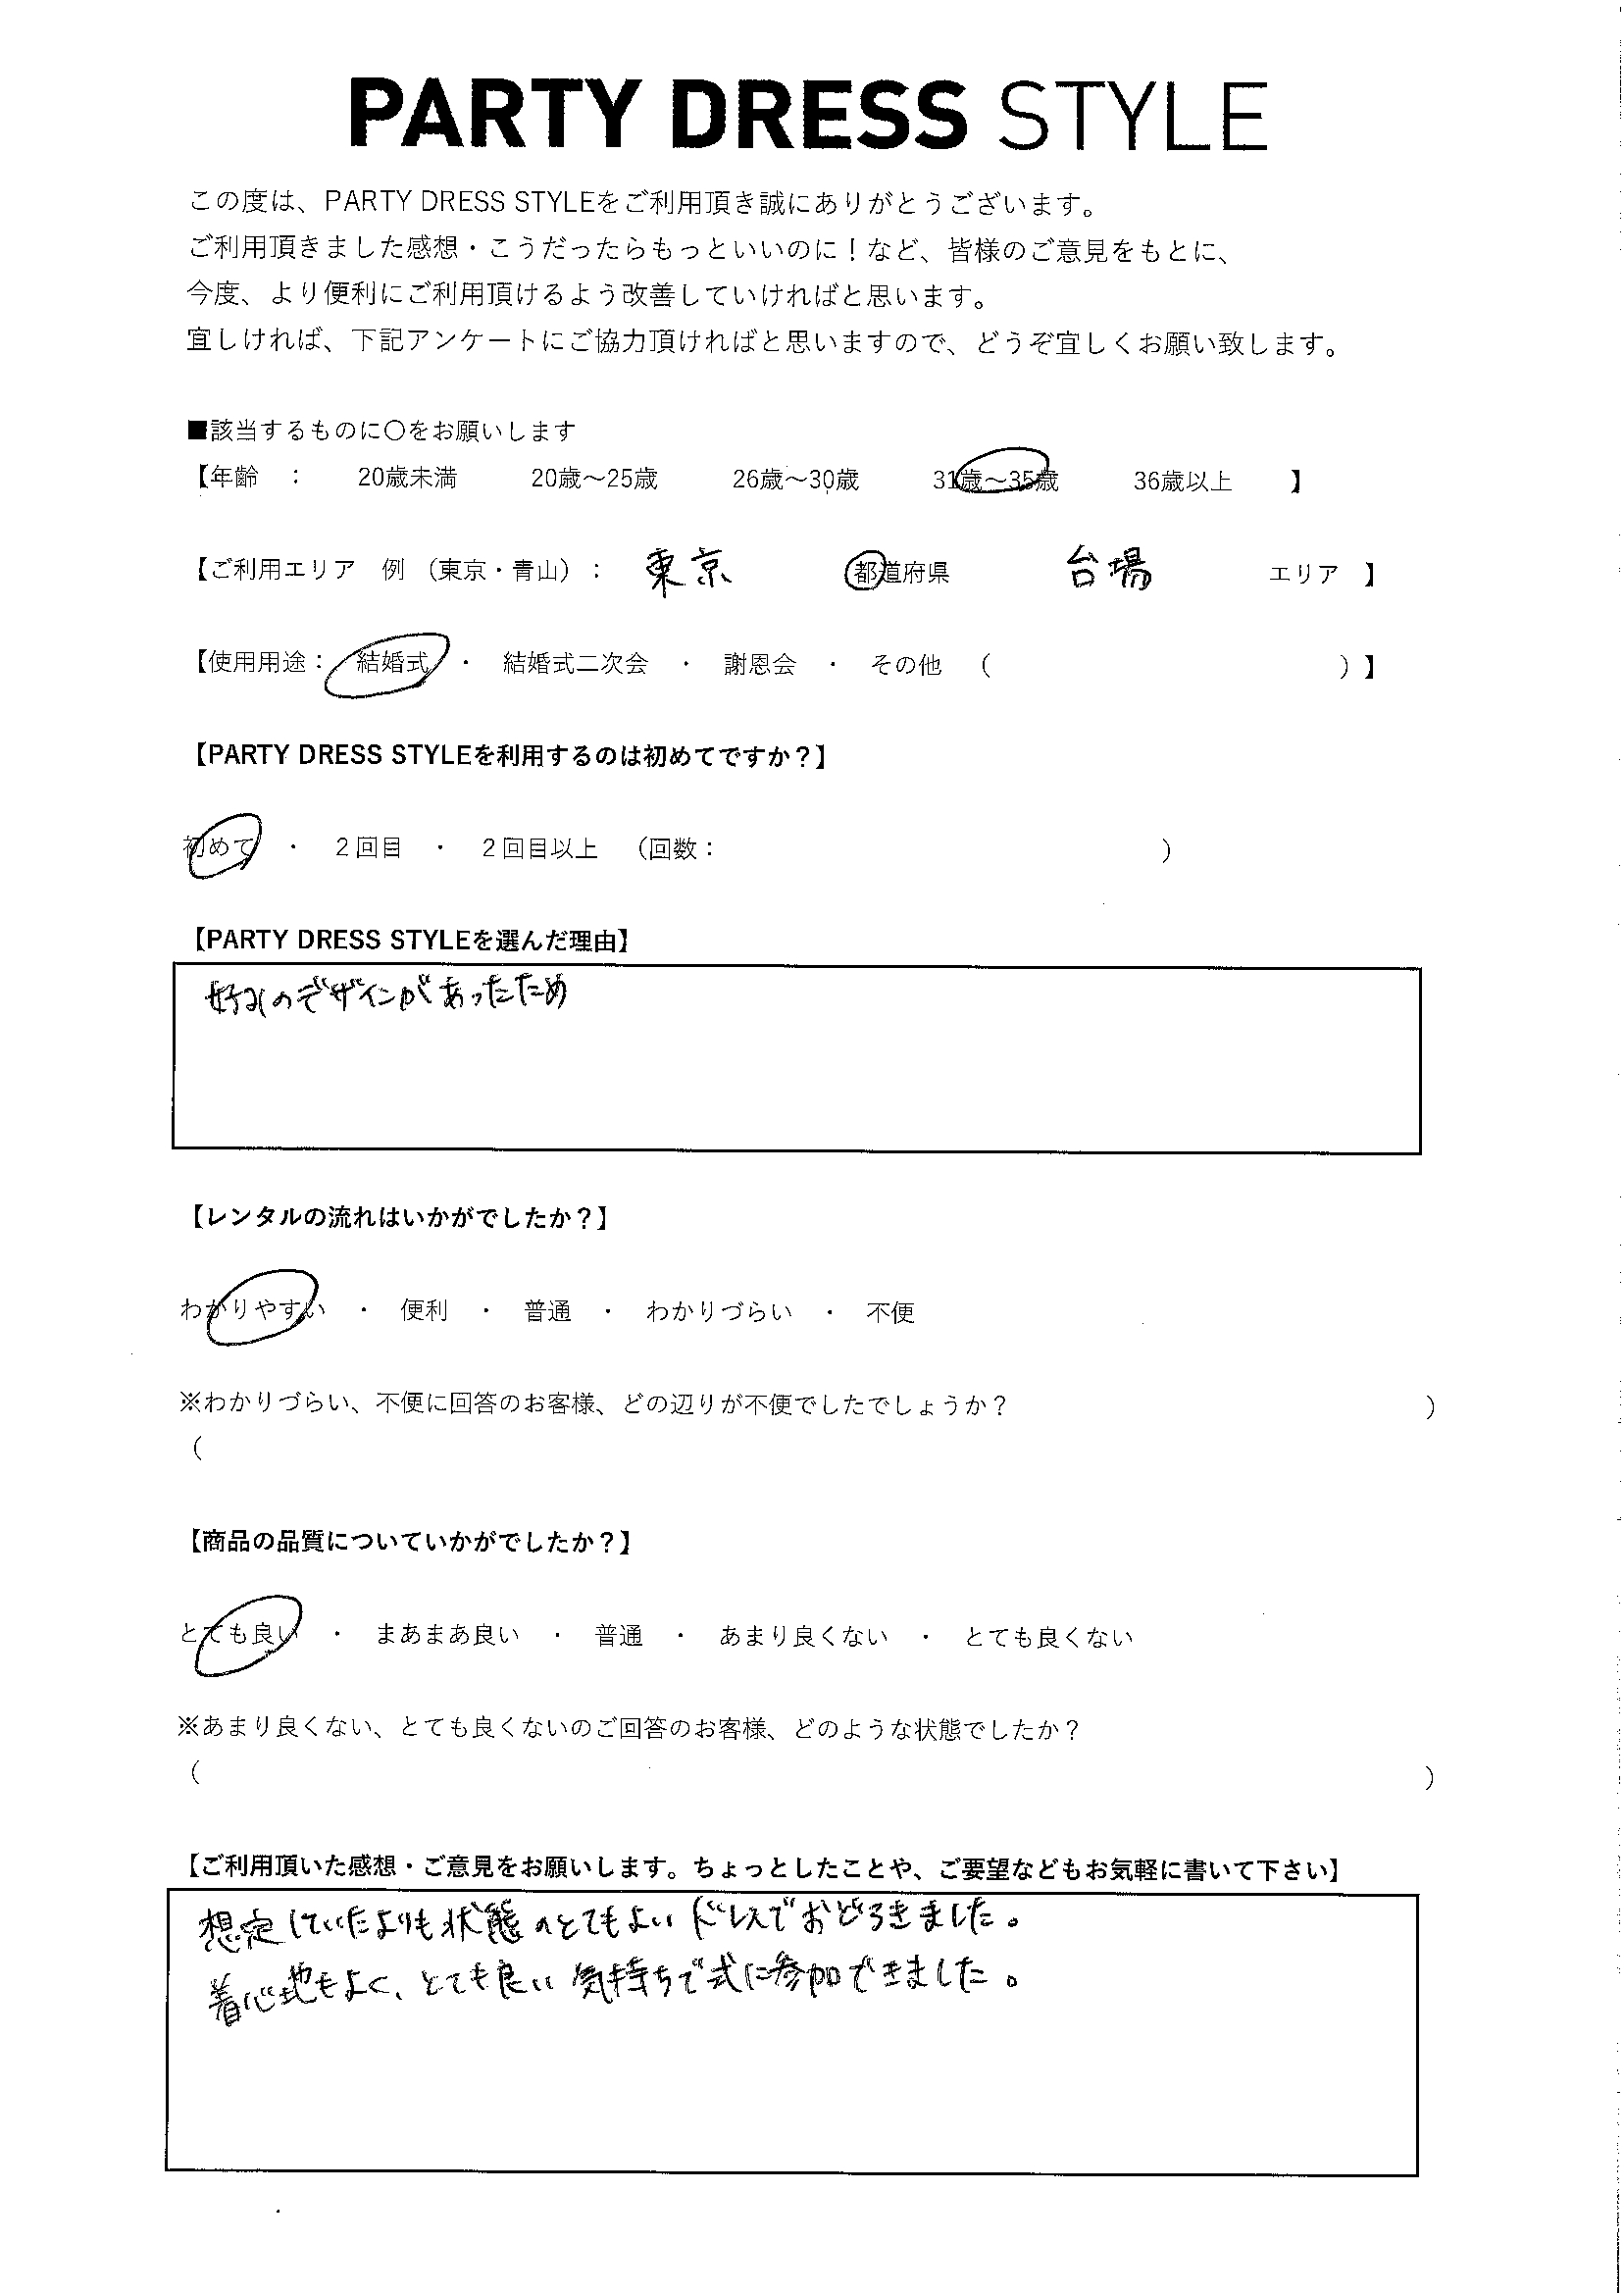 6/1結婚式利用 東京都・台場エリア